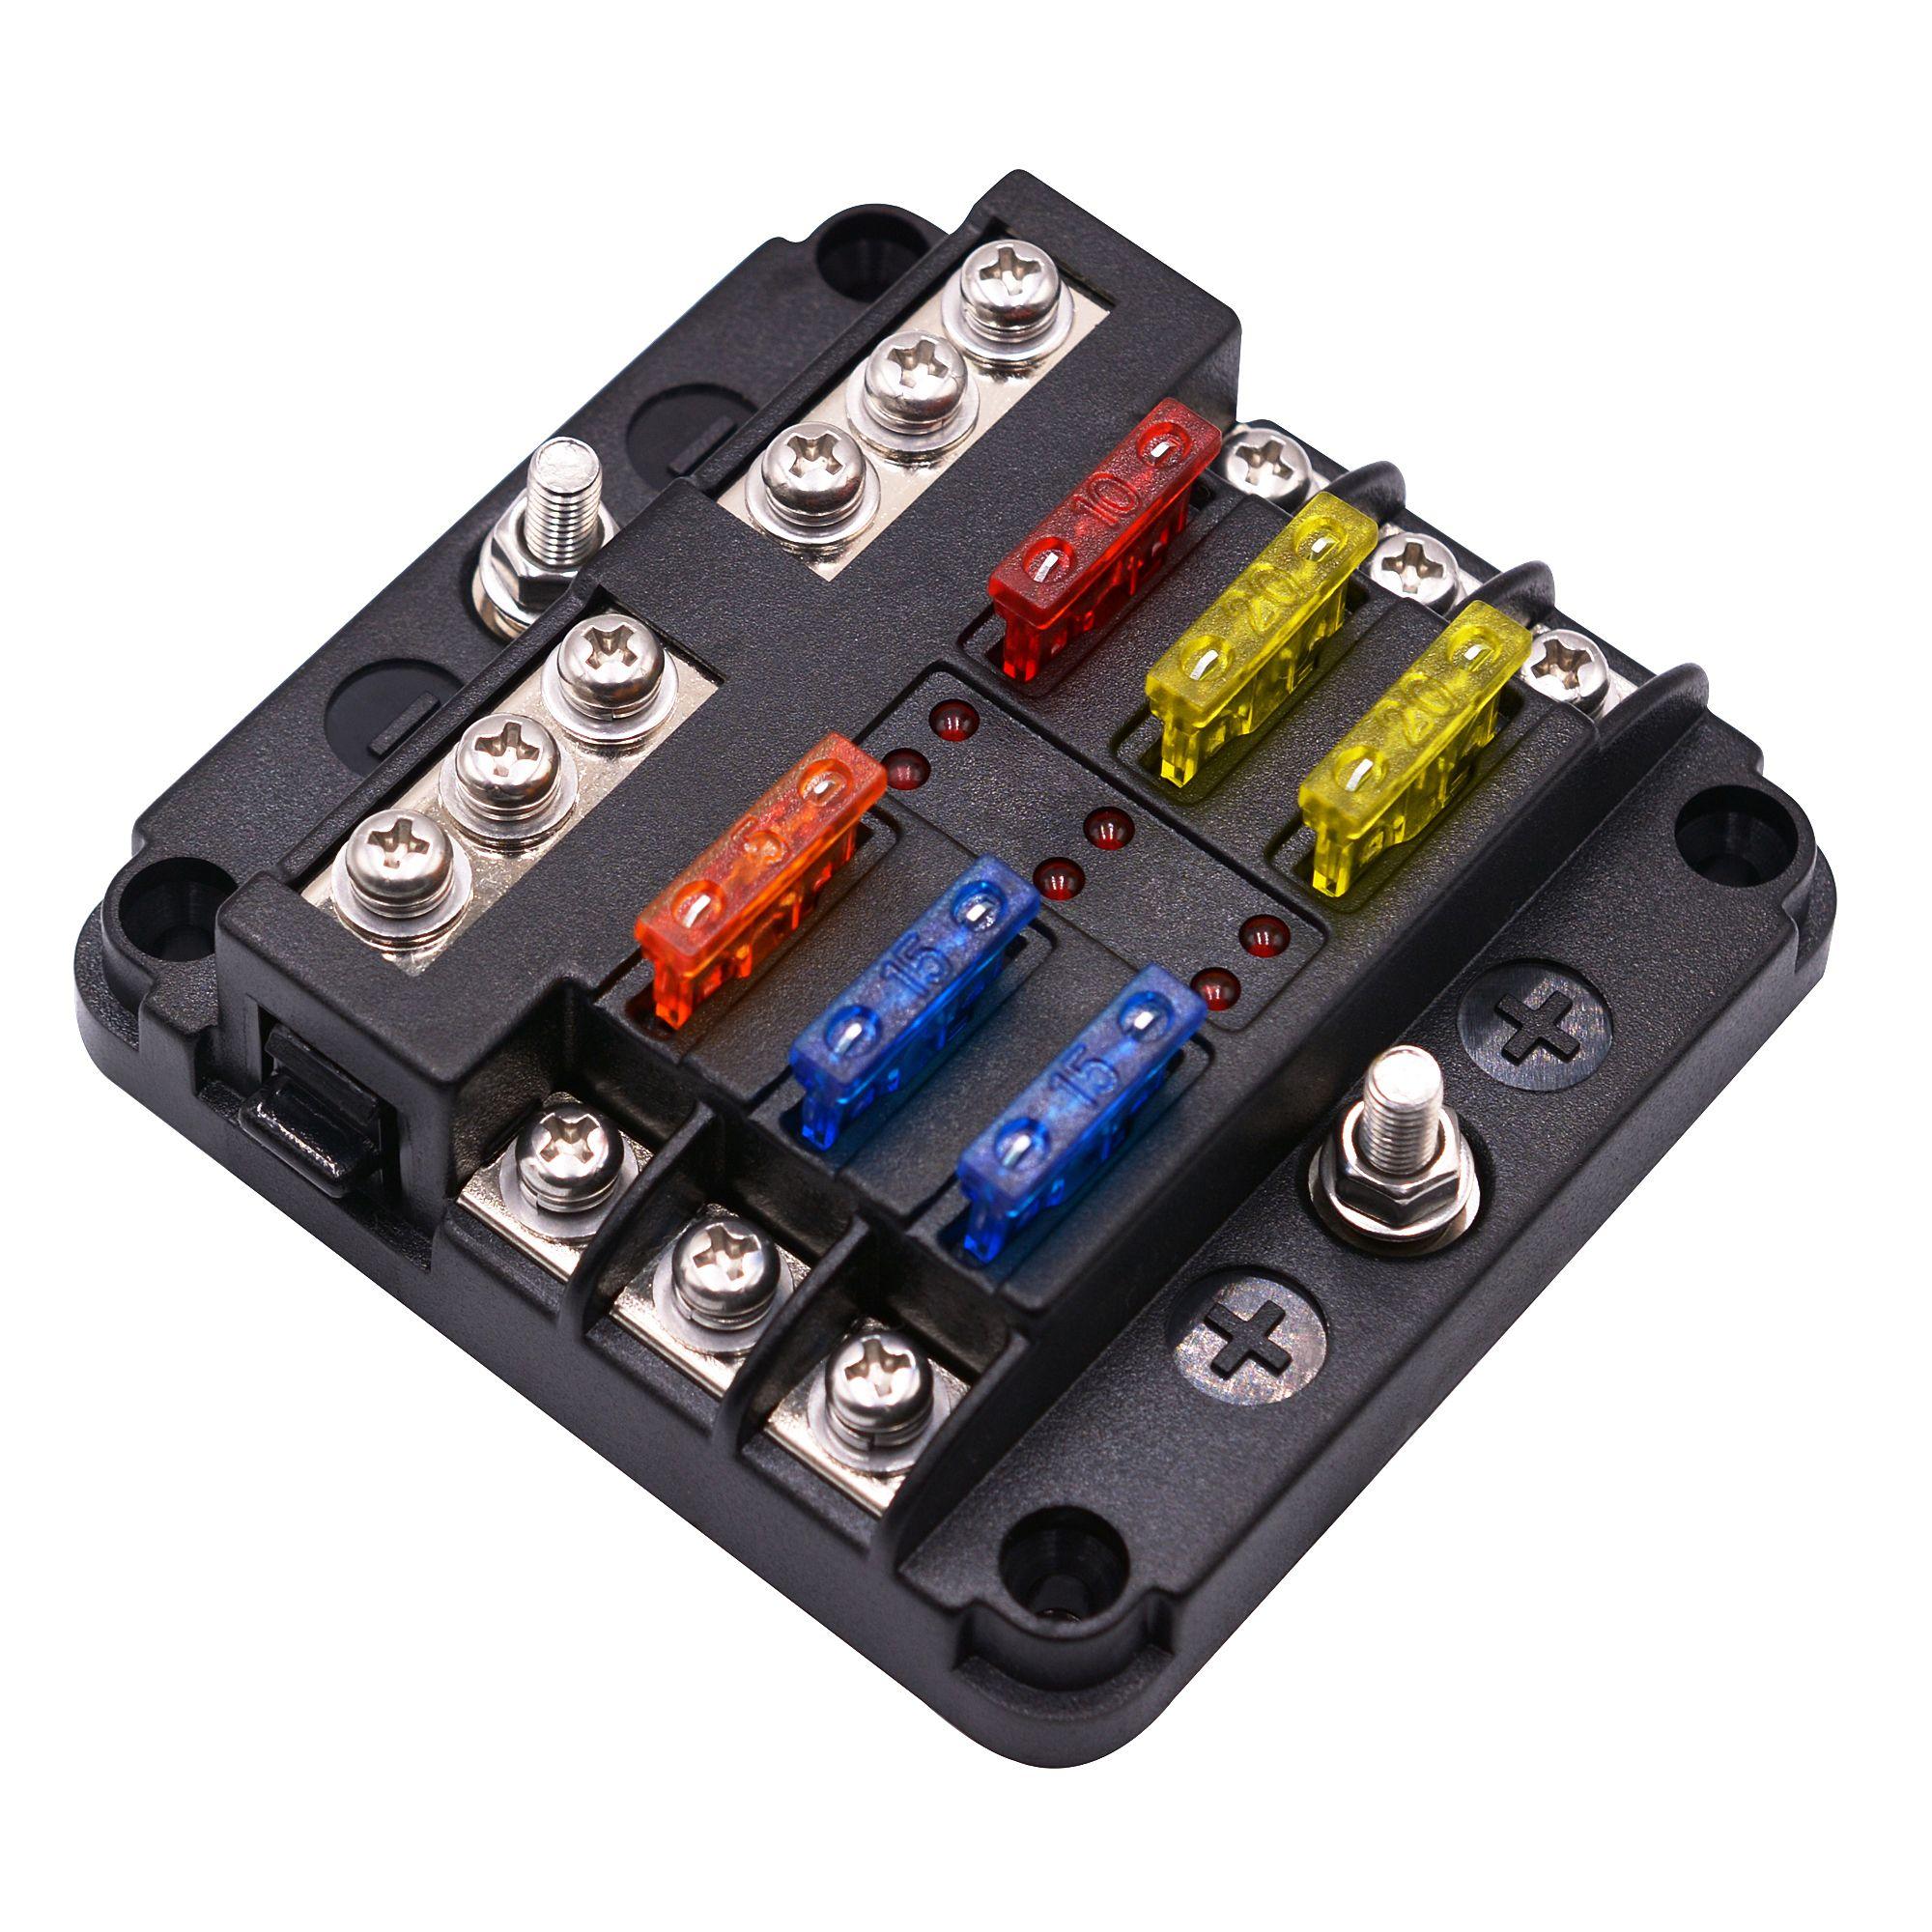 ST Blade Fuse Block مع مؤشر تحذير LED غطاء مقاوم للرطوبة - 6 دوائر مع ناقل سلبي فيوز بوكس لشاحنة RV للسيارة